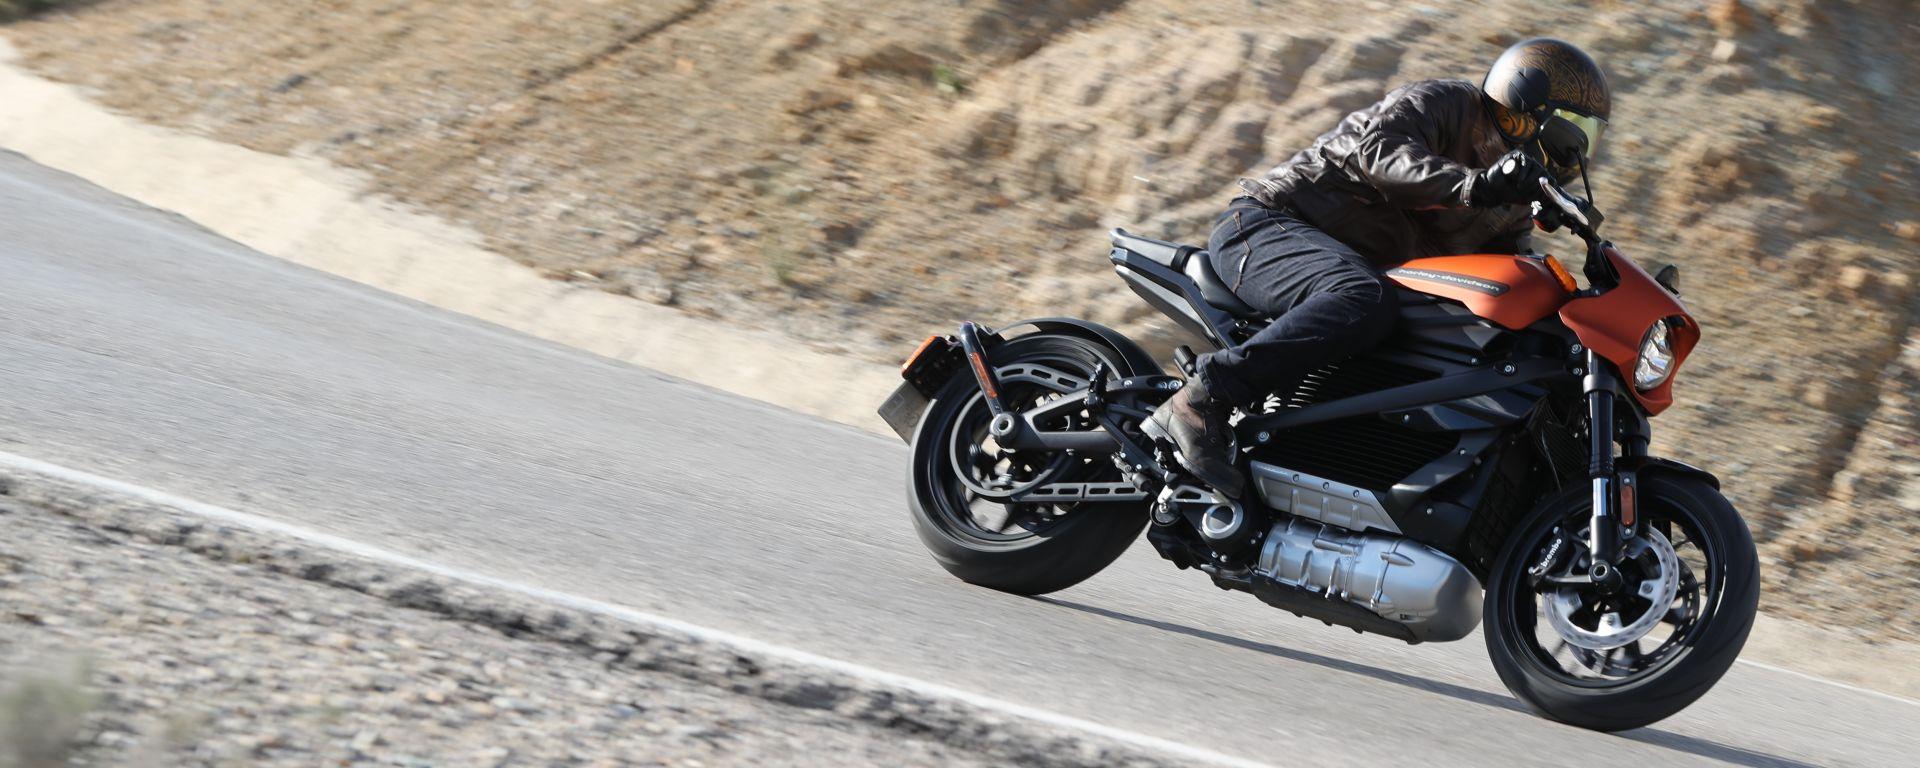 Tra le curve con la Harley-Davidson LiveWire